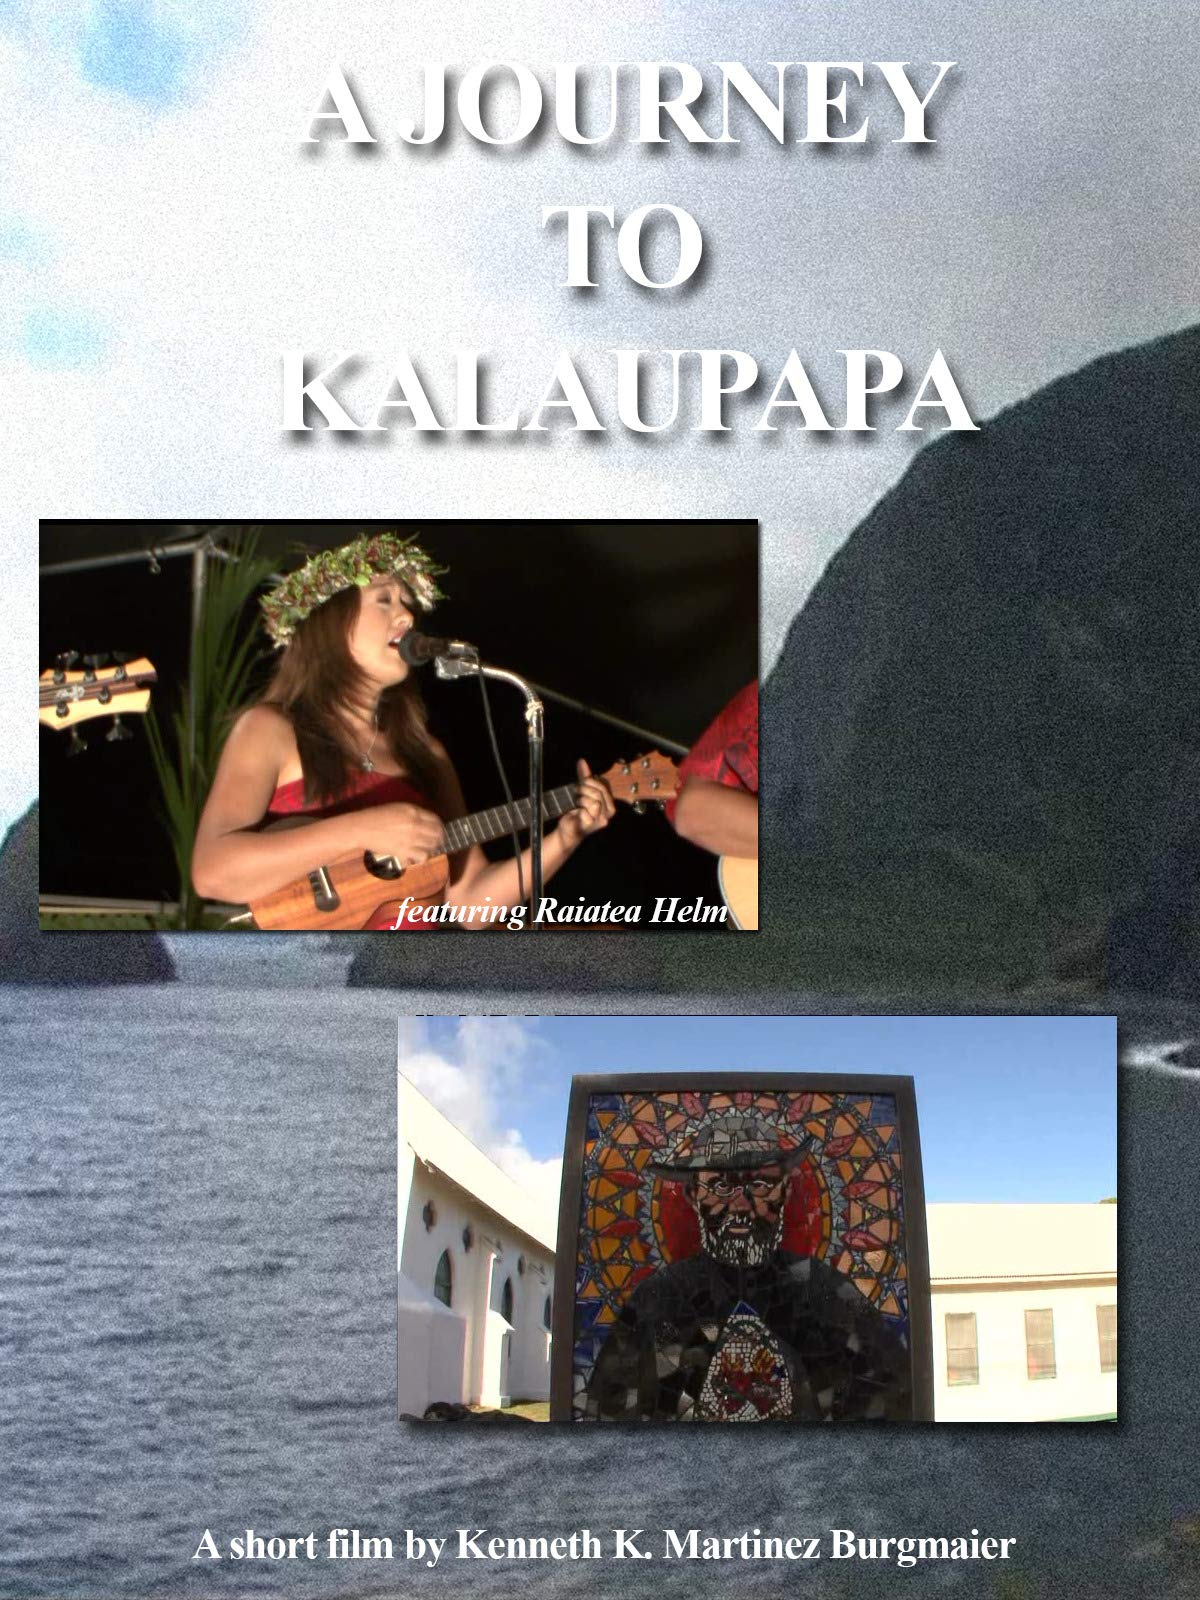 A Journey To Kalaupapa